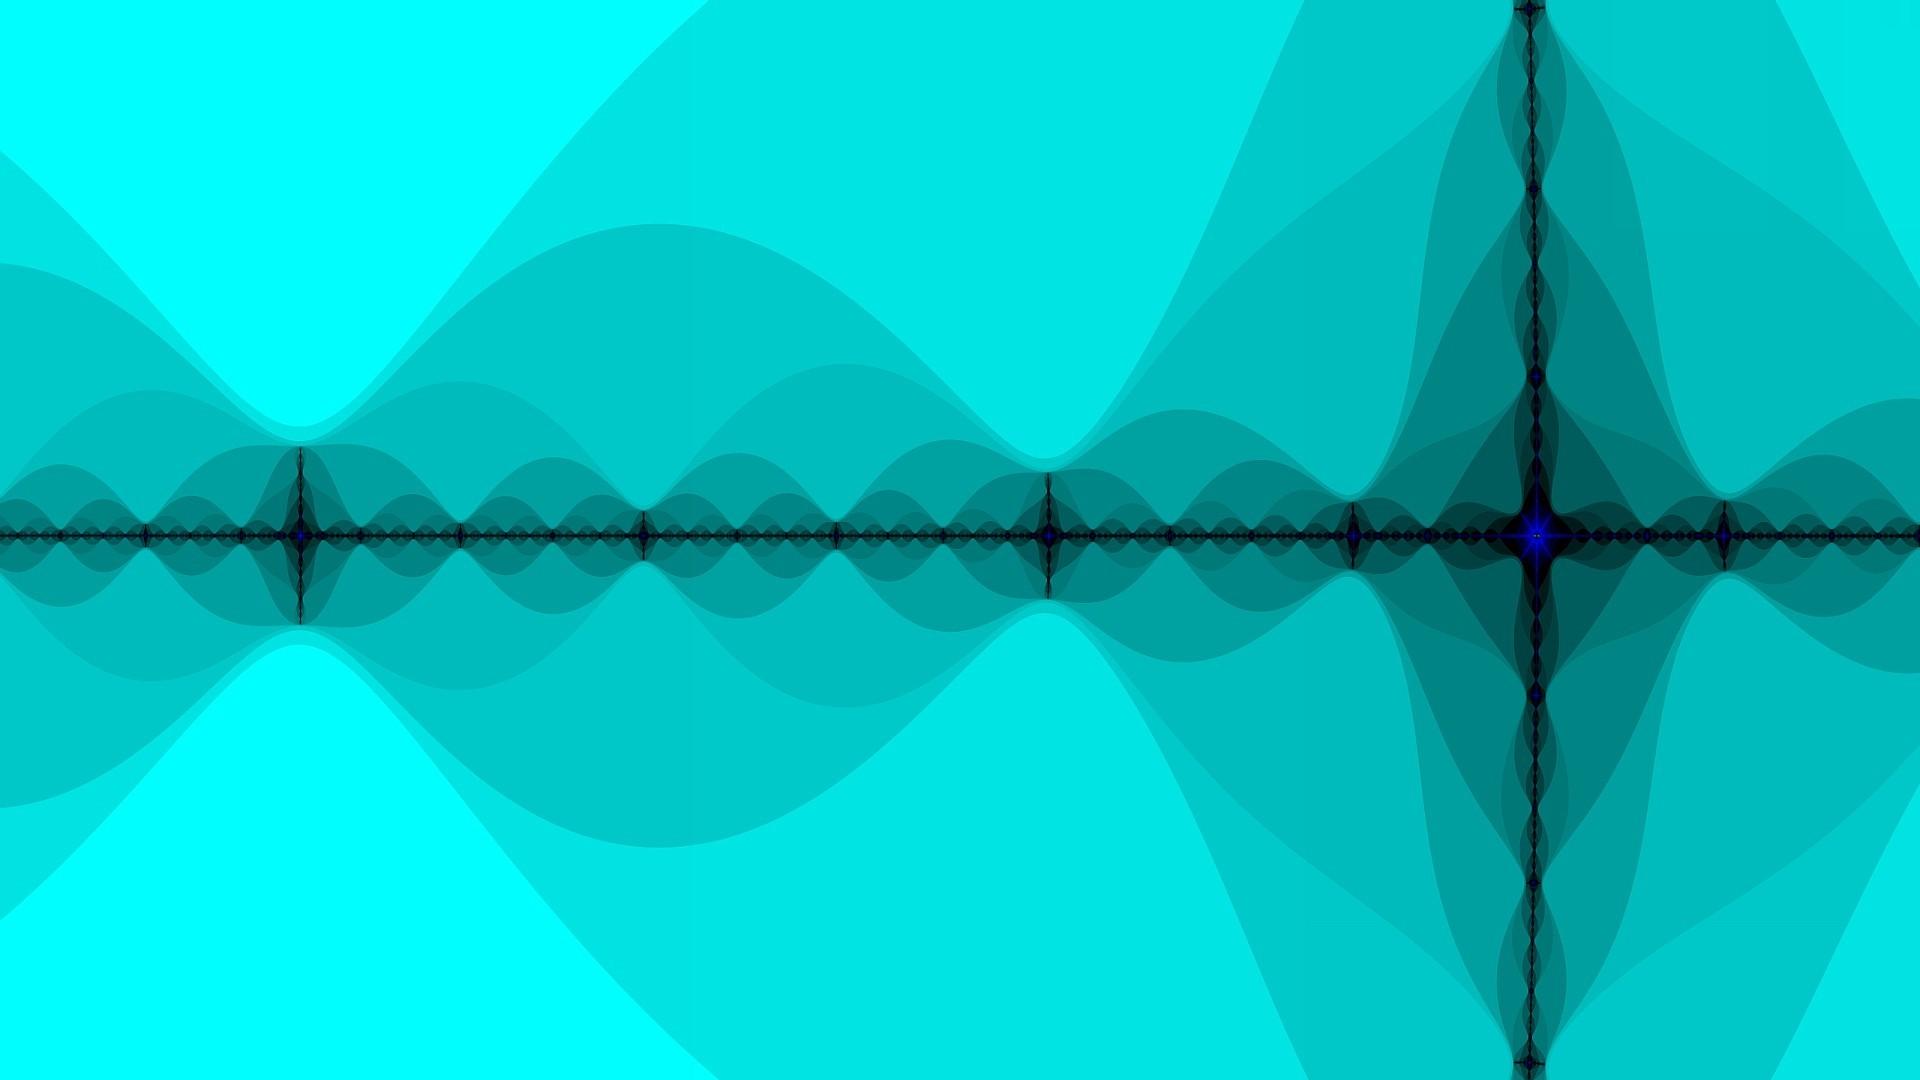 Sound waves wallpaper 12179 1920x1080